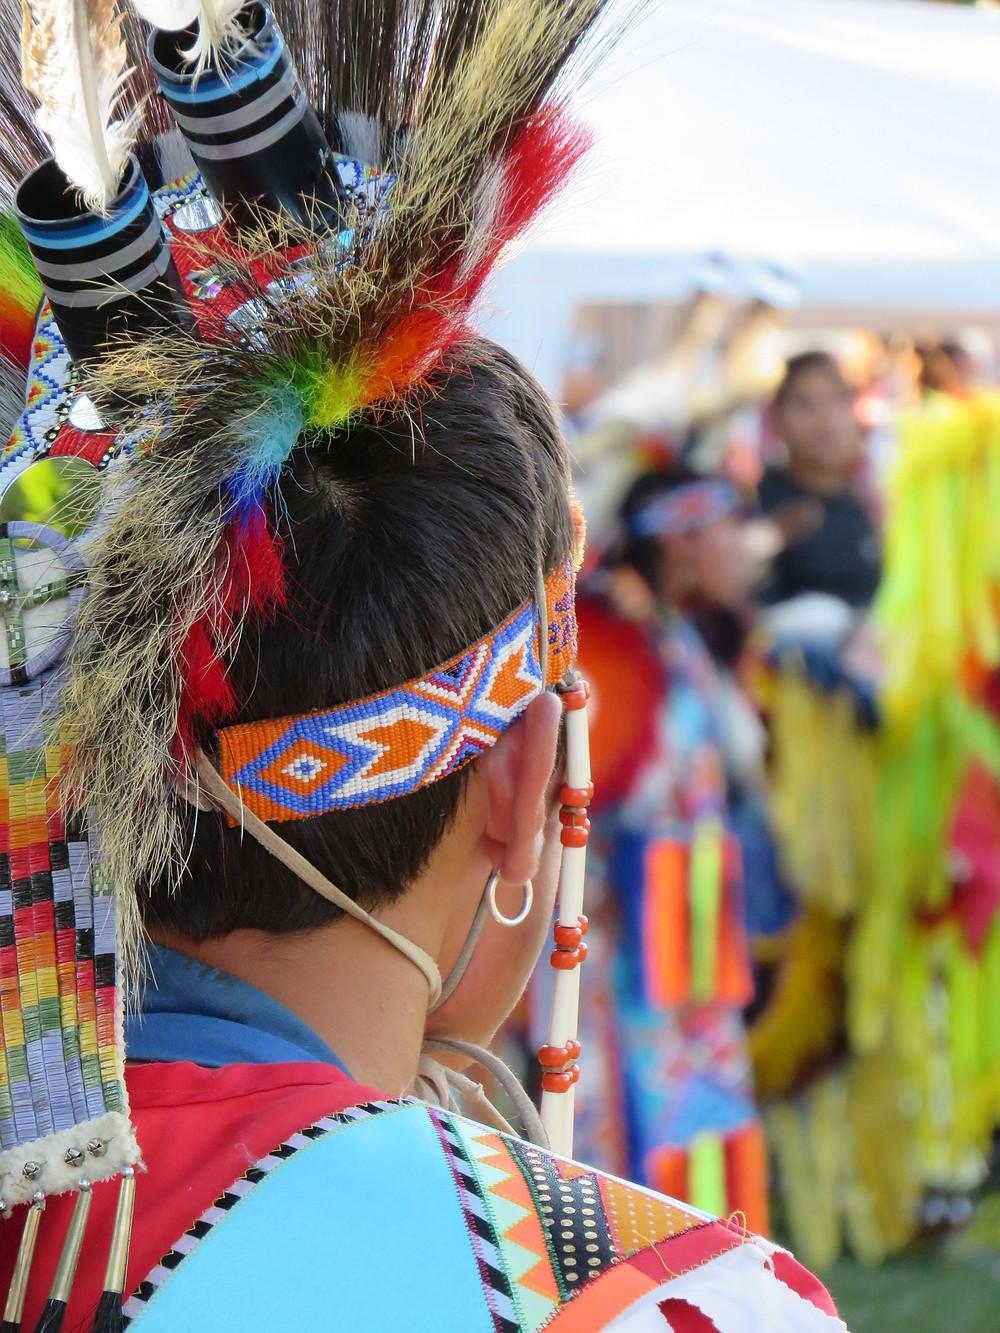 #NativeAmericans, #Americanindians, #identitycrime